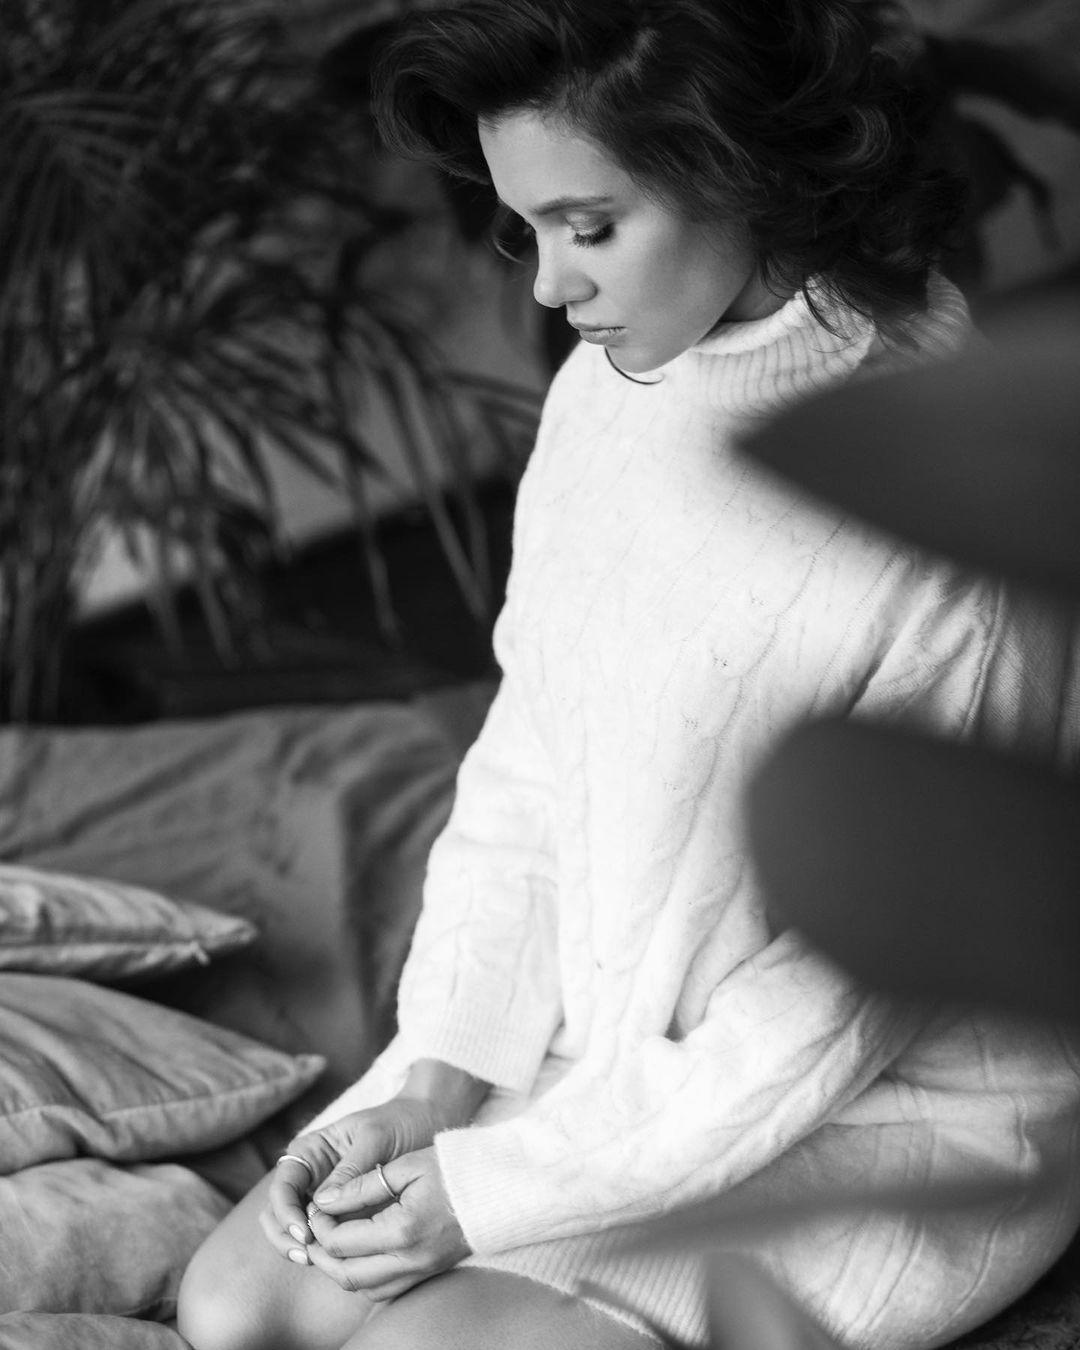 Галина Безрук / © instagram.com/galina_bezruk